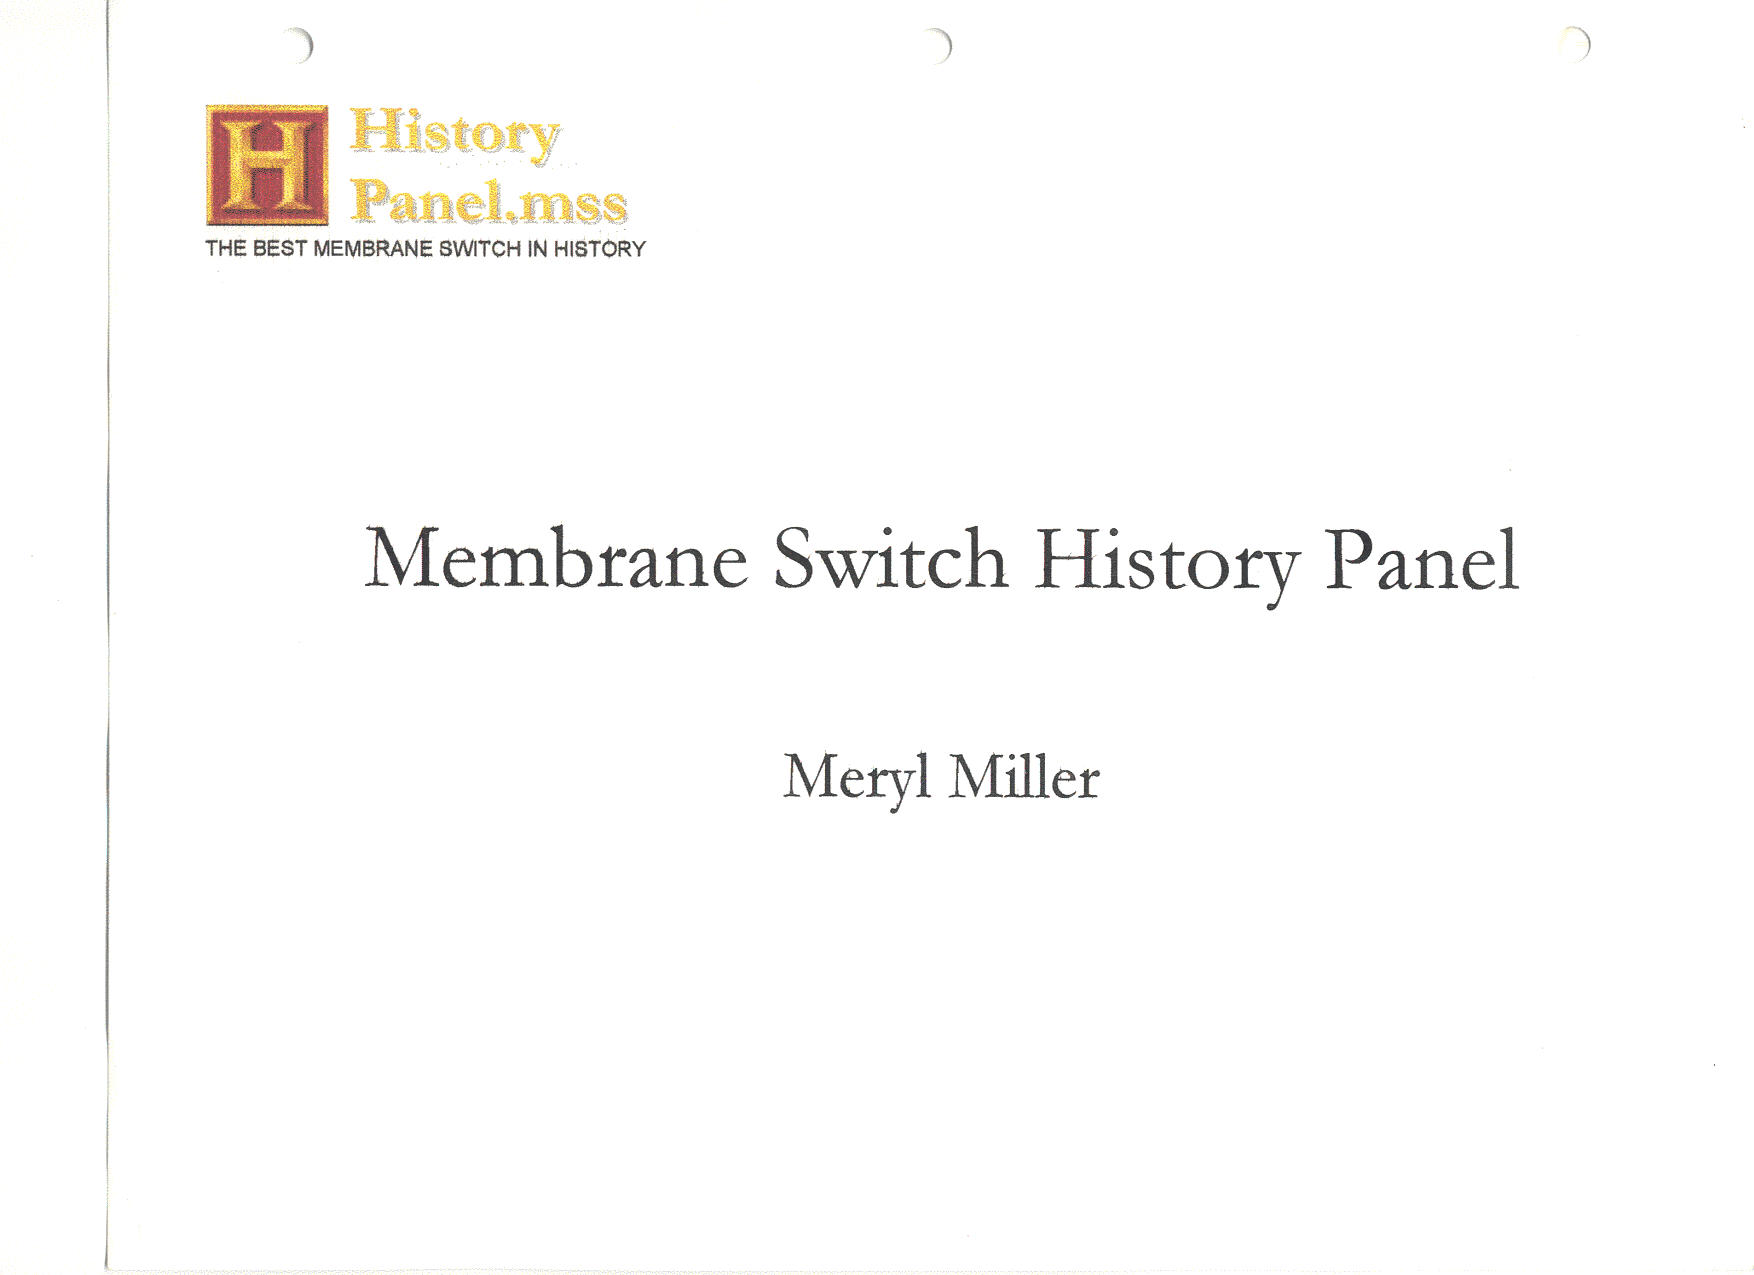 History Panel - cover.jpg